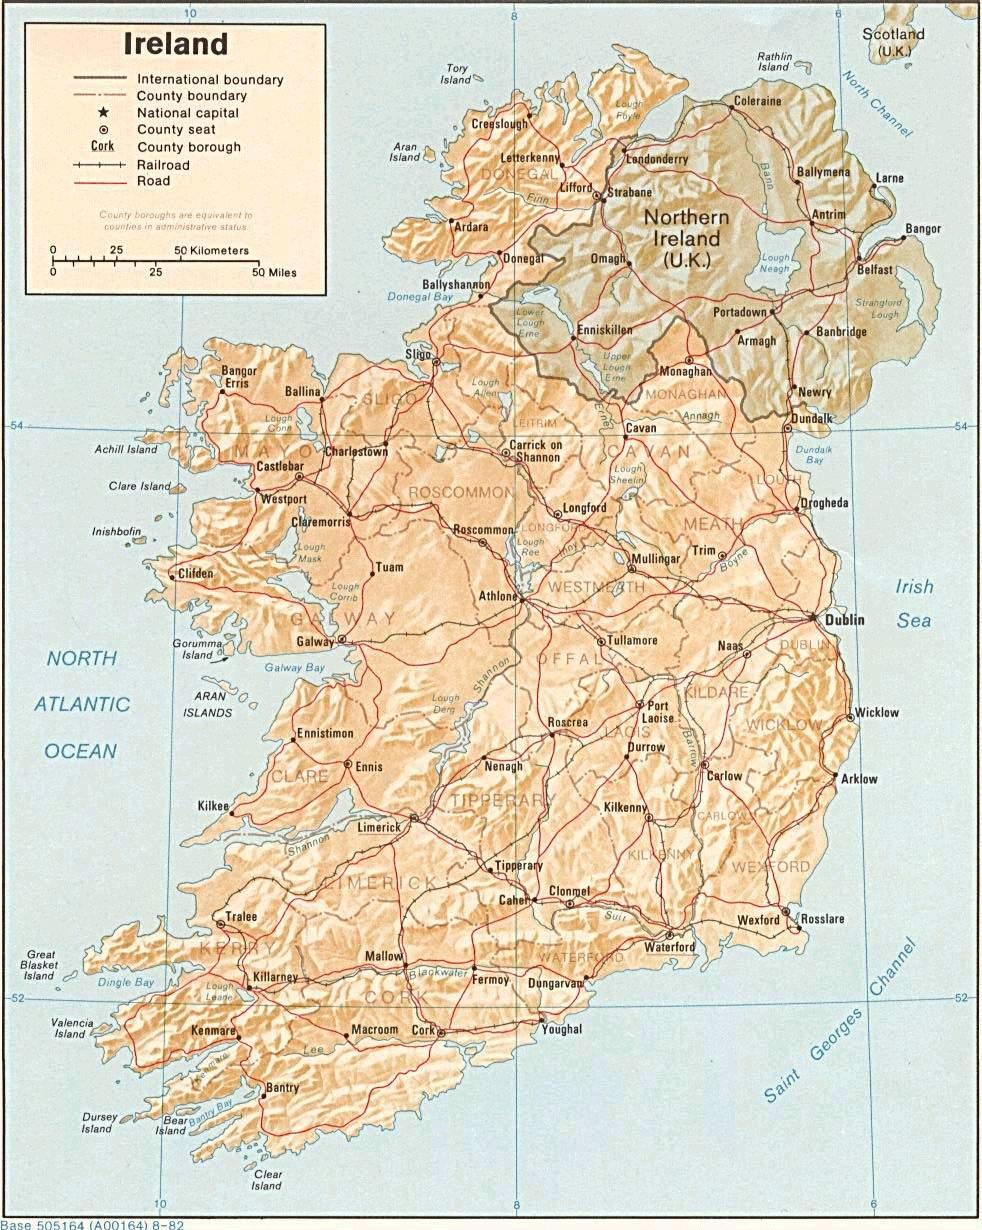 Mapa Grande da Irlanda 1